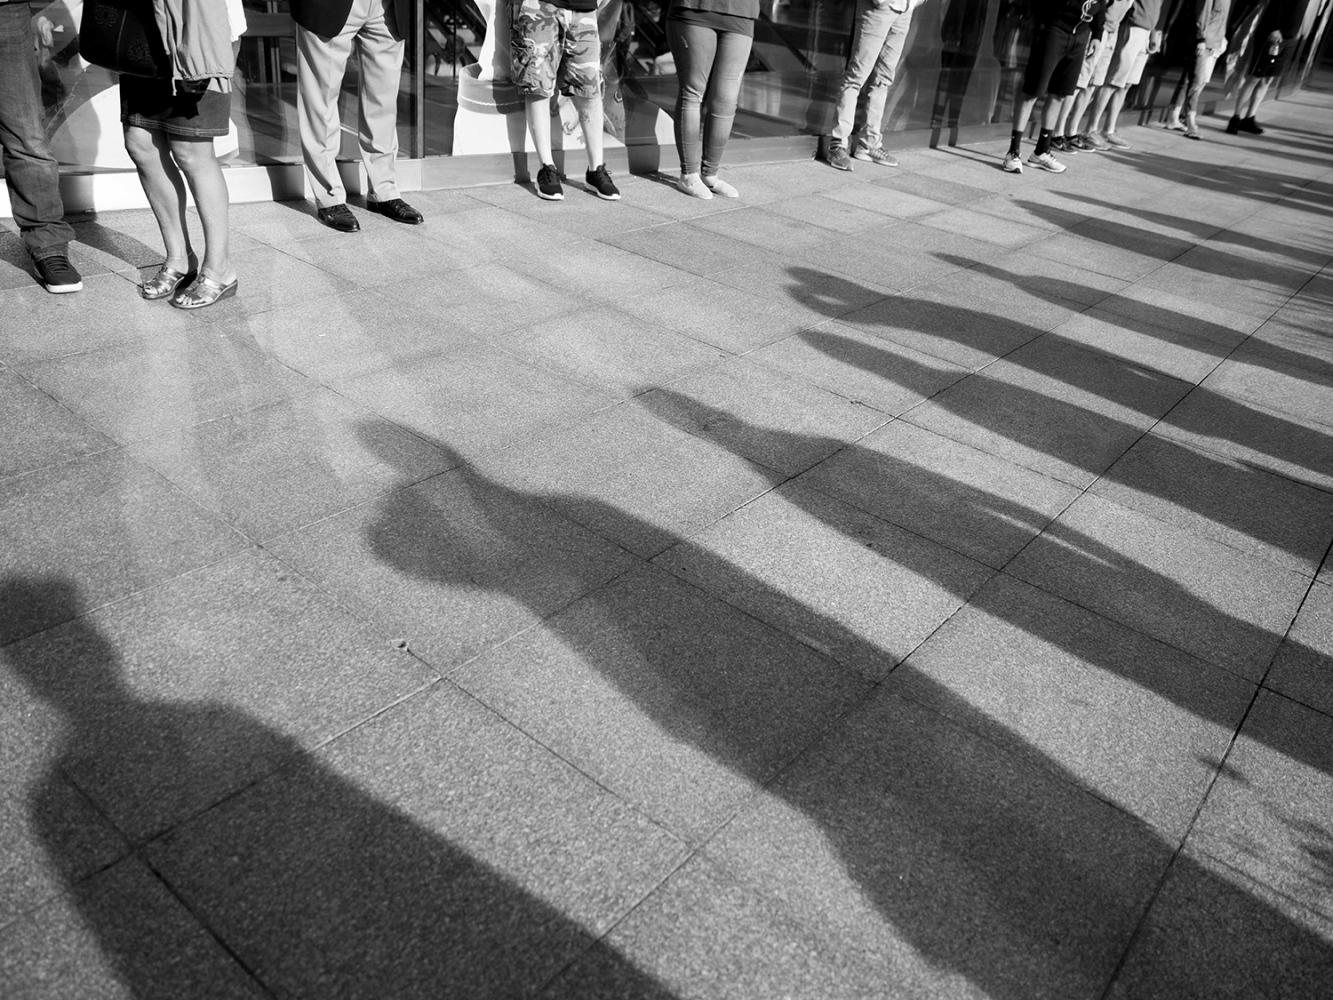 People standing on the sidewalk, New York, 2017.